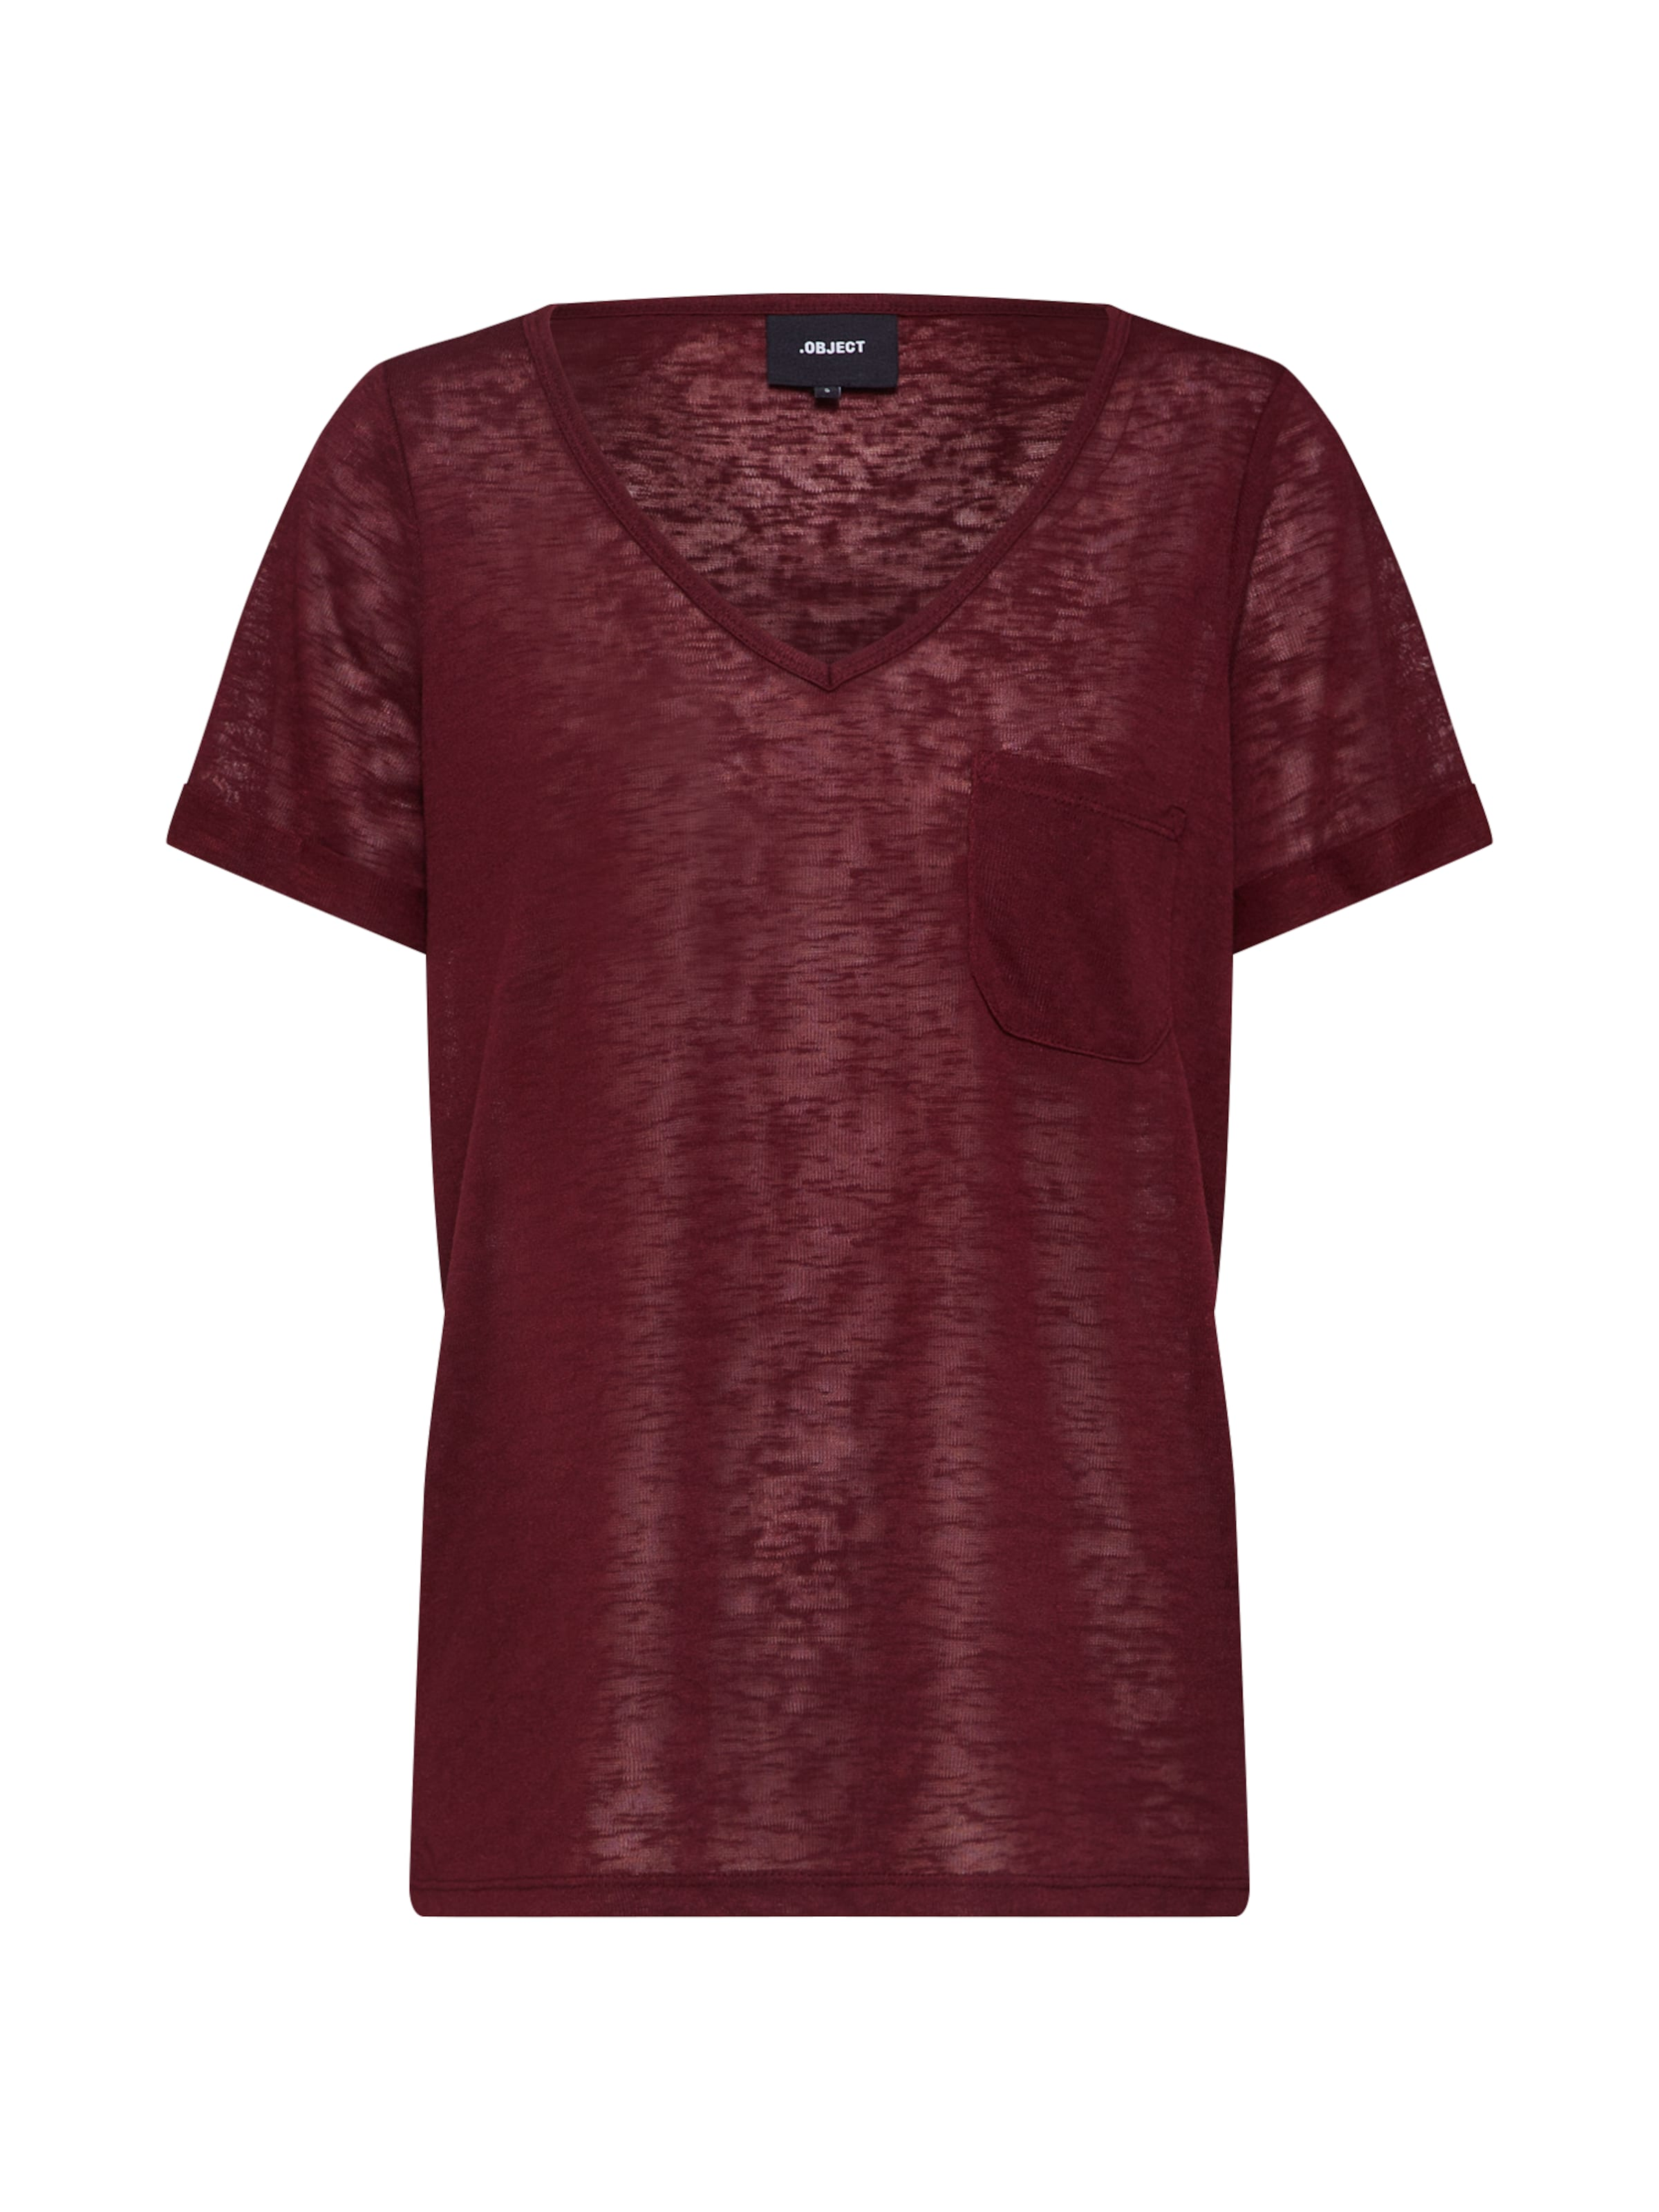 T shirt In Object 'objtessi' Burgunder oxBCeWrd